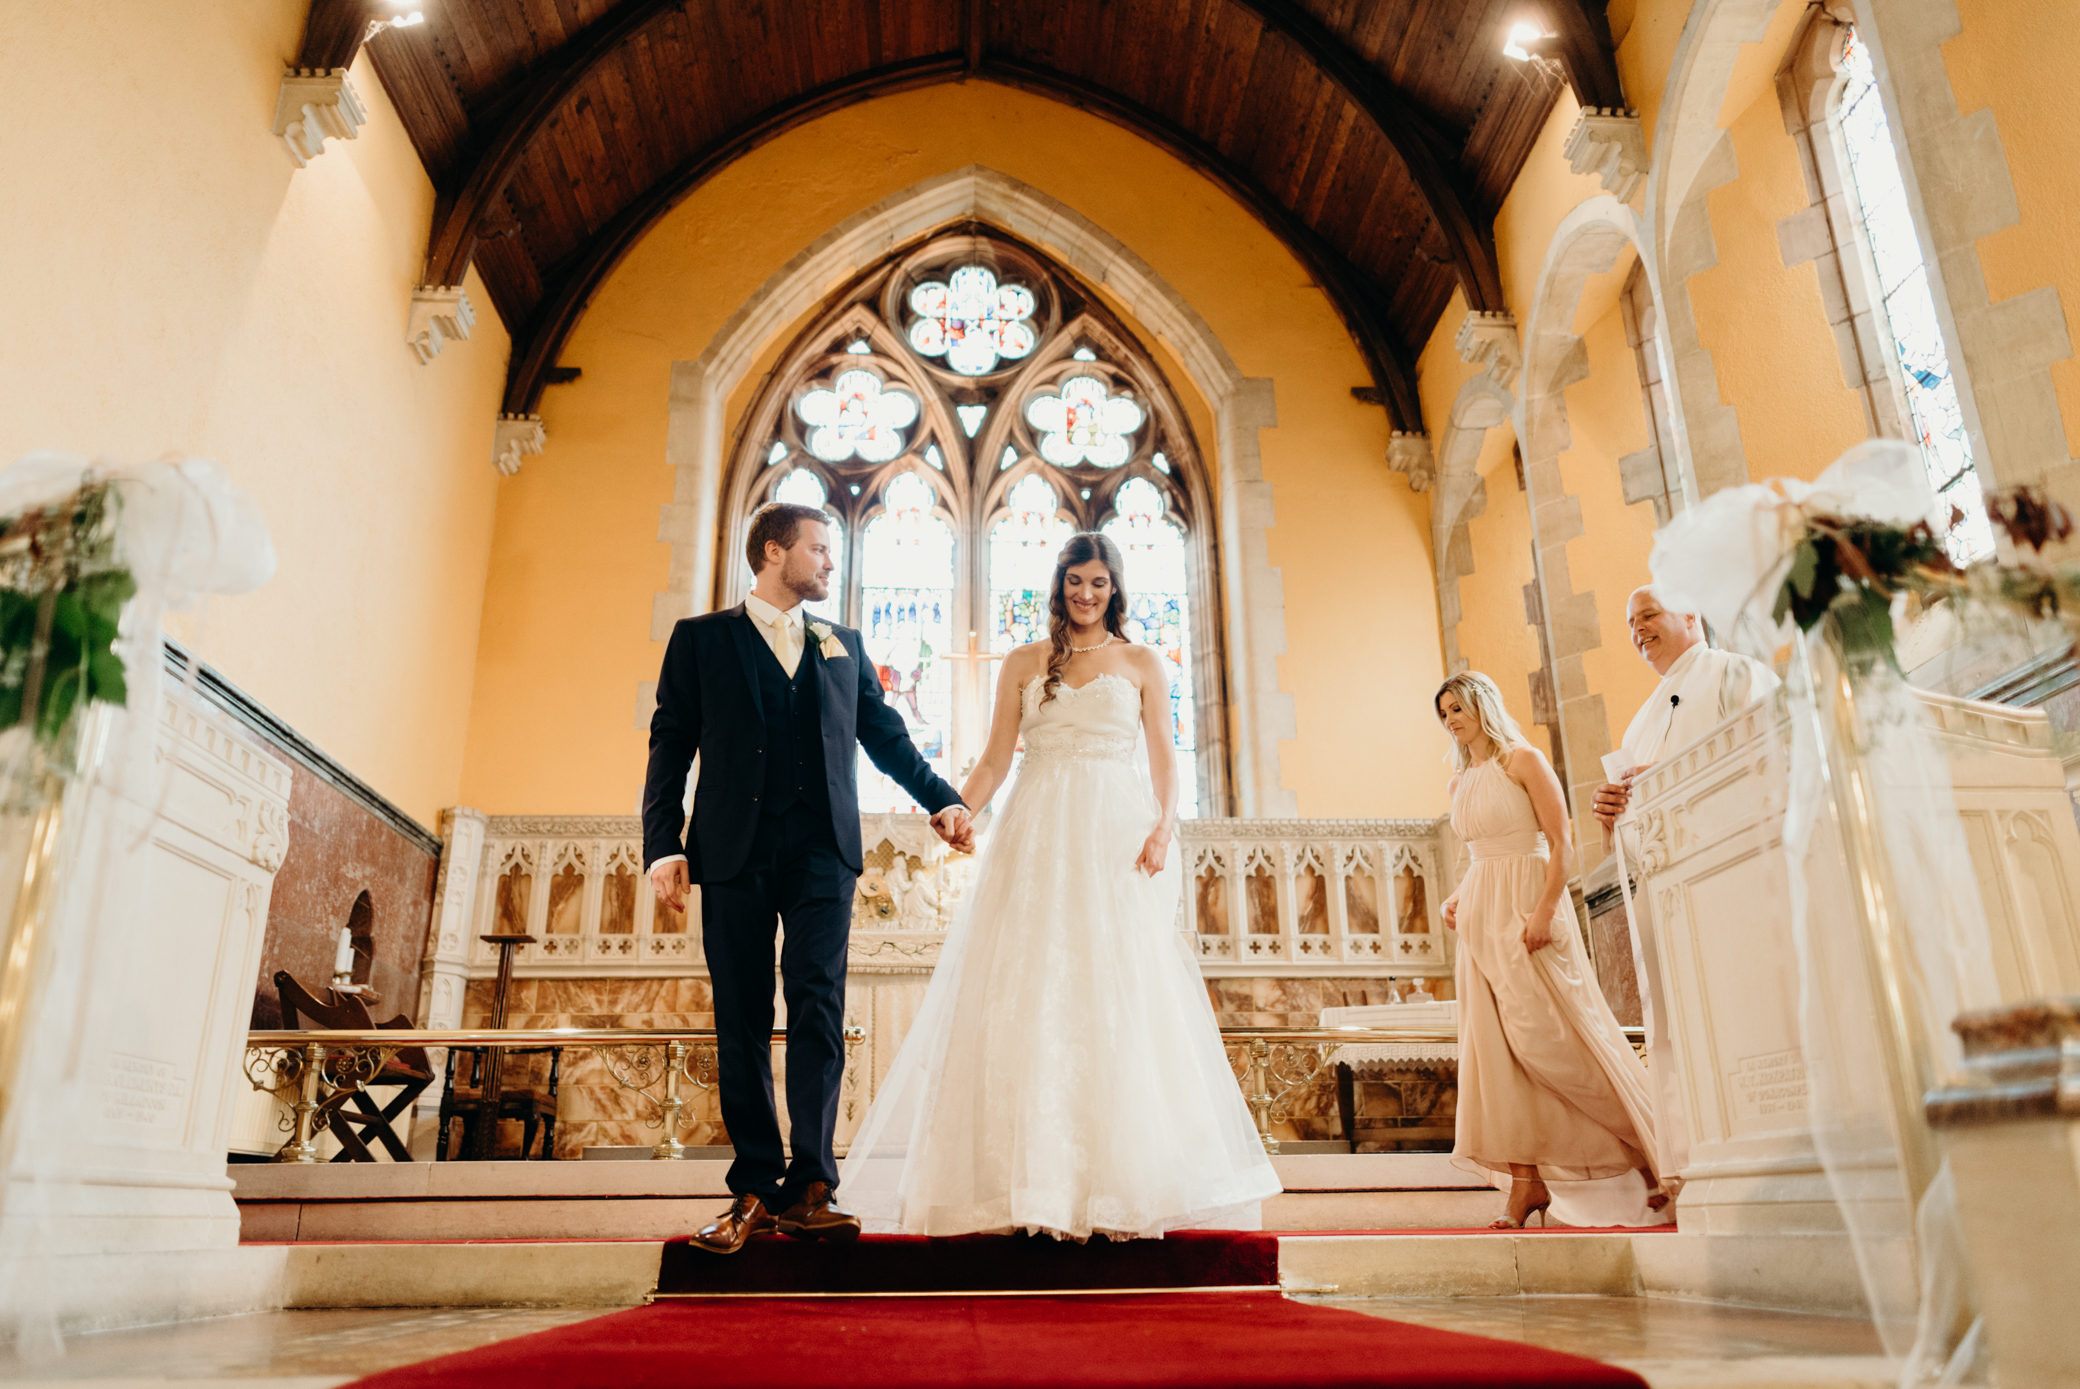 Castletown House - Celbridge Manor Hotel Wedding - Elopement Ireland-120.jpg